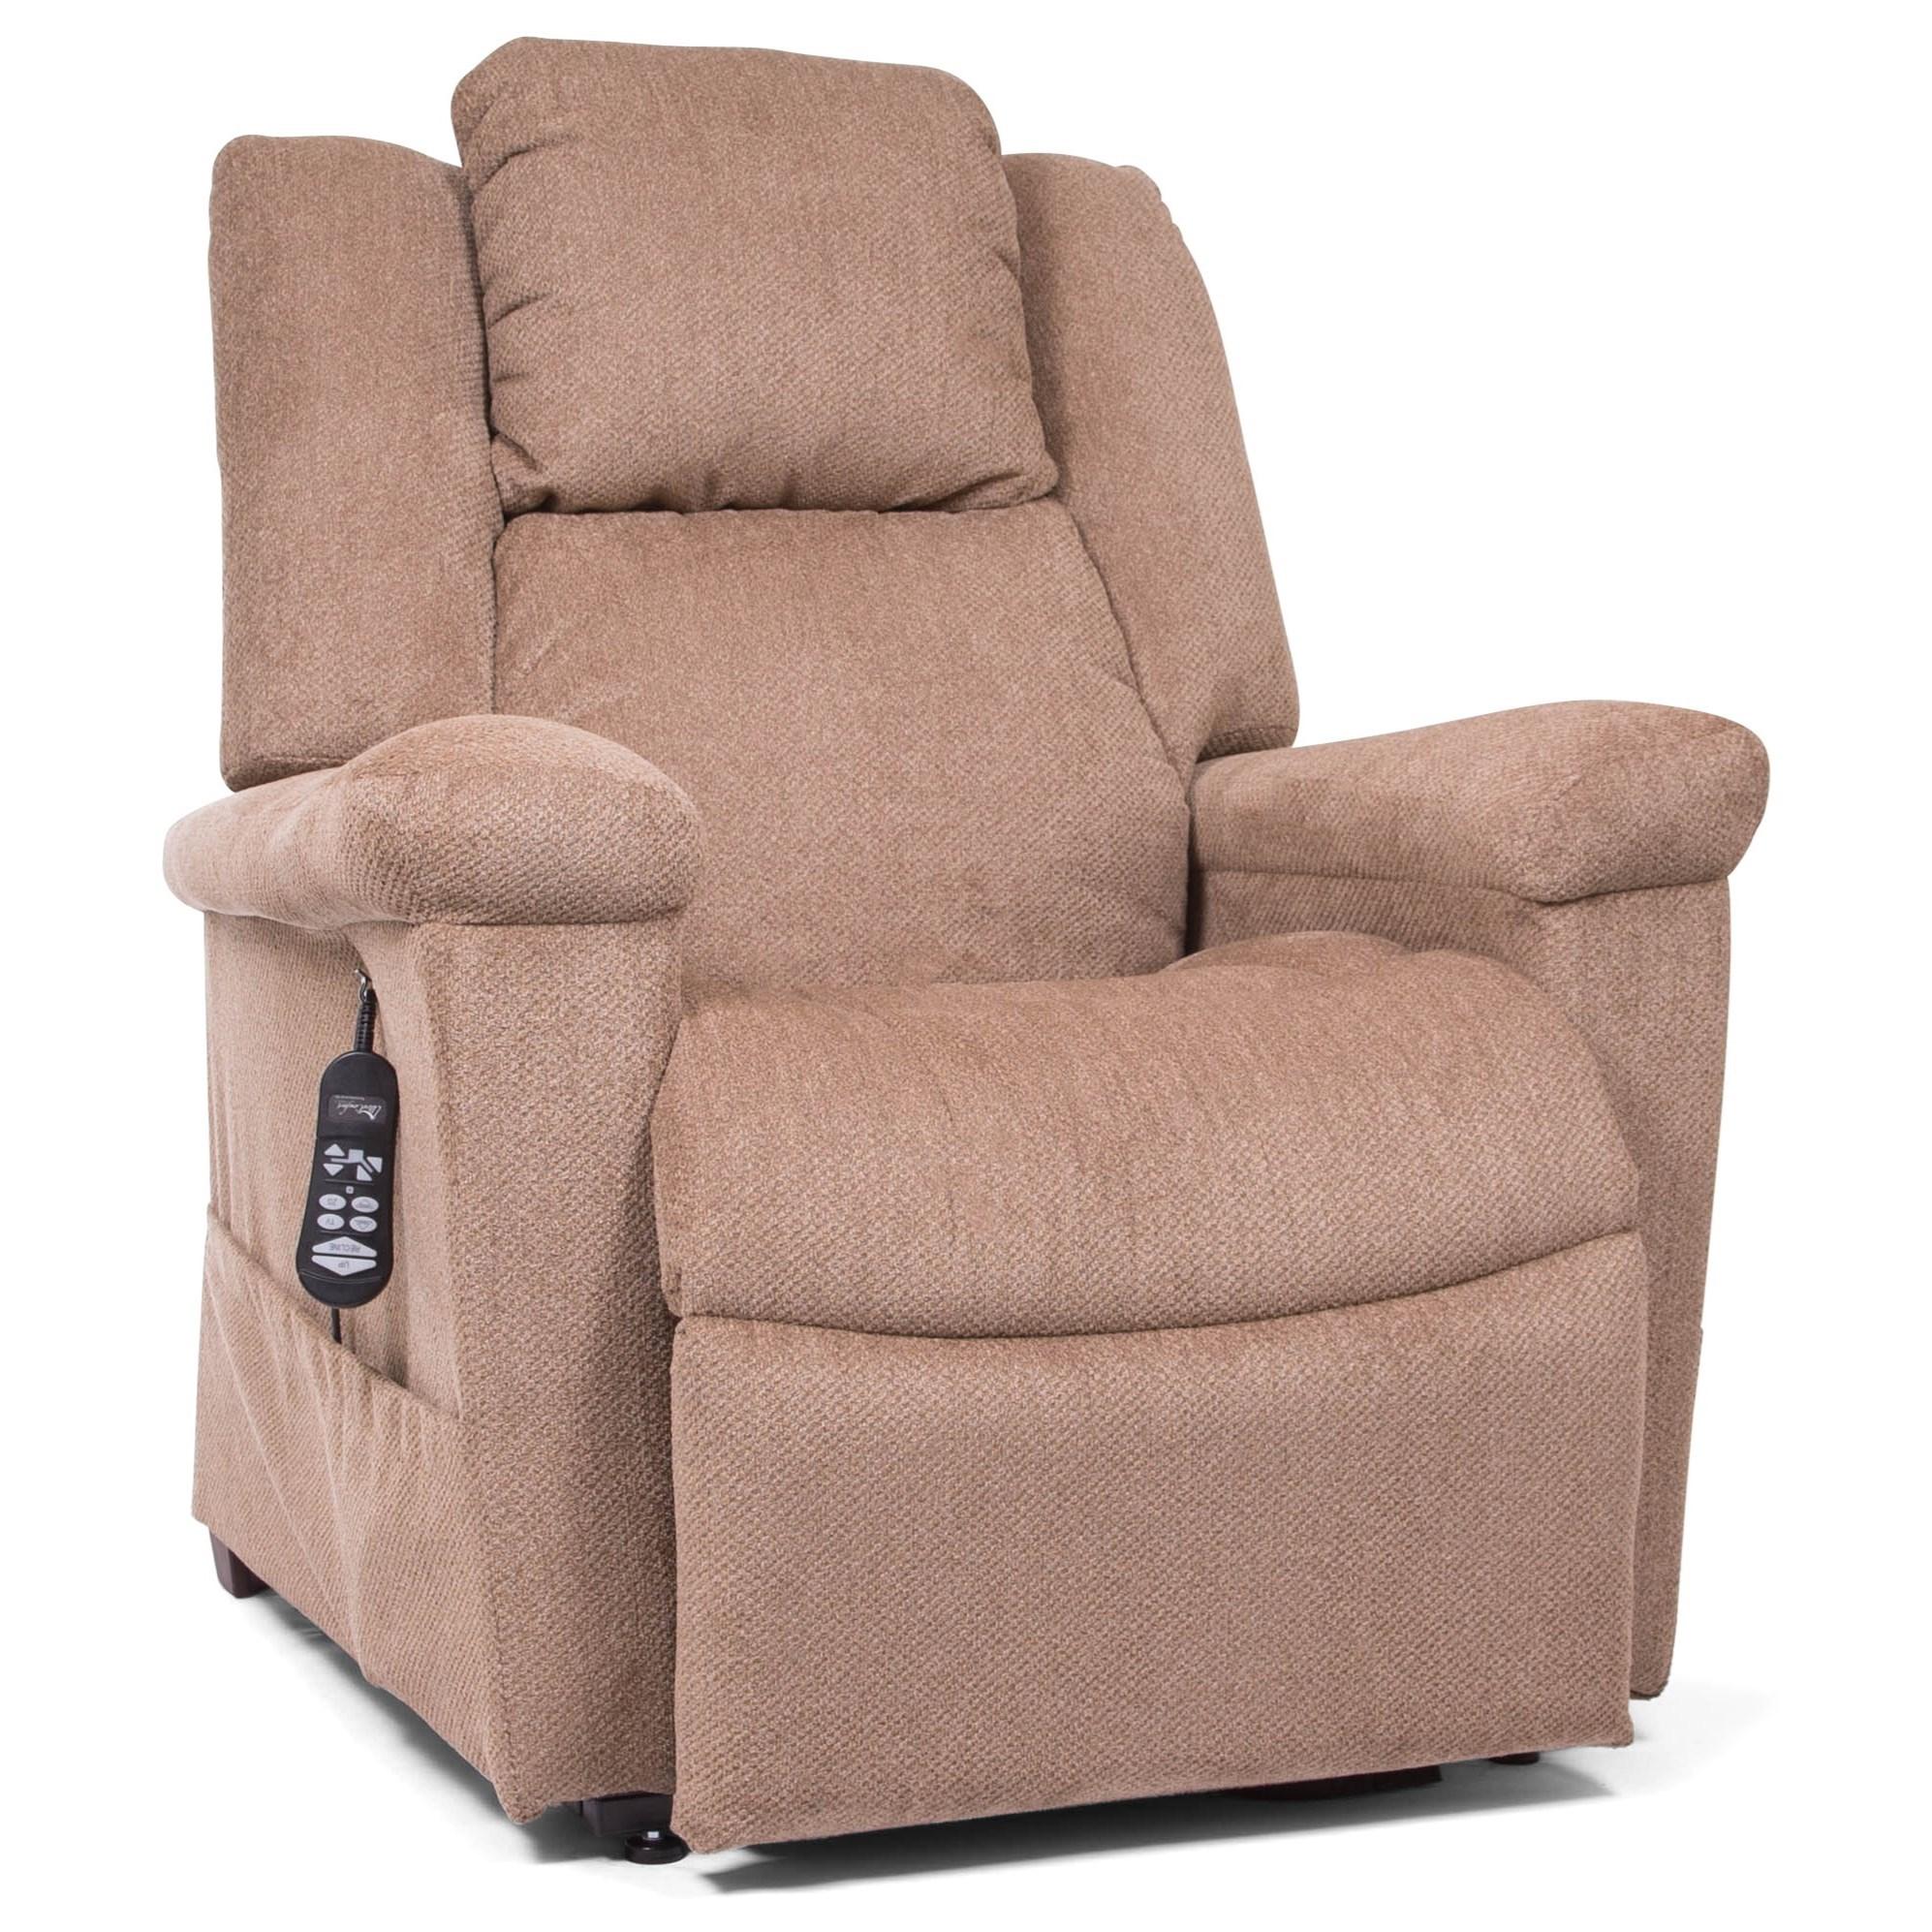 StellarComfort Estrella Power Pillow Lift Chair by UltraComfort at Darvin Furniture